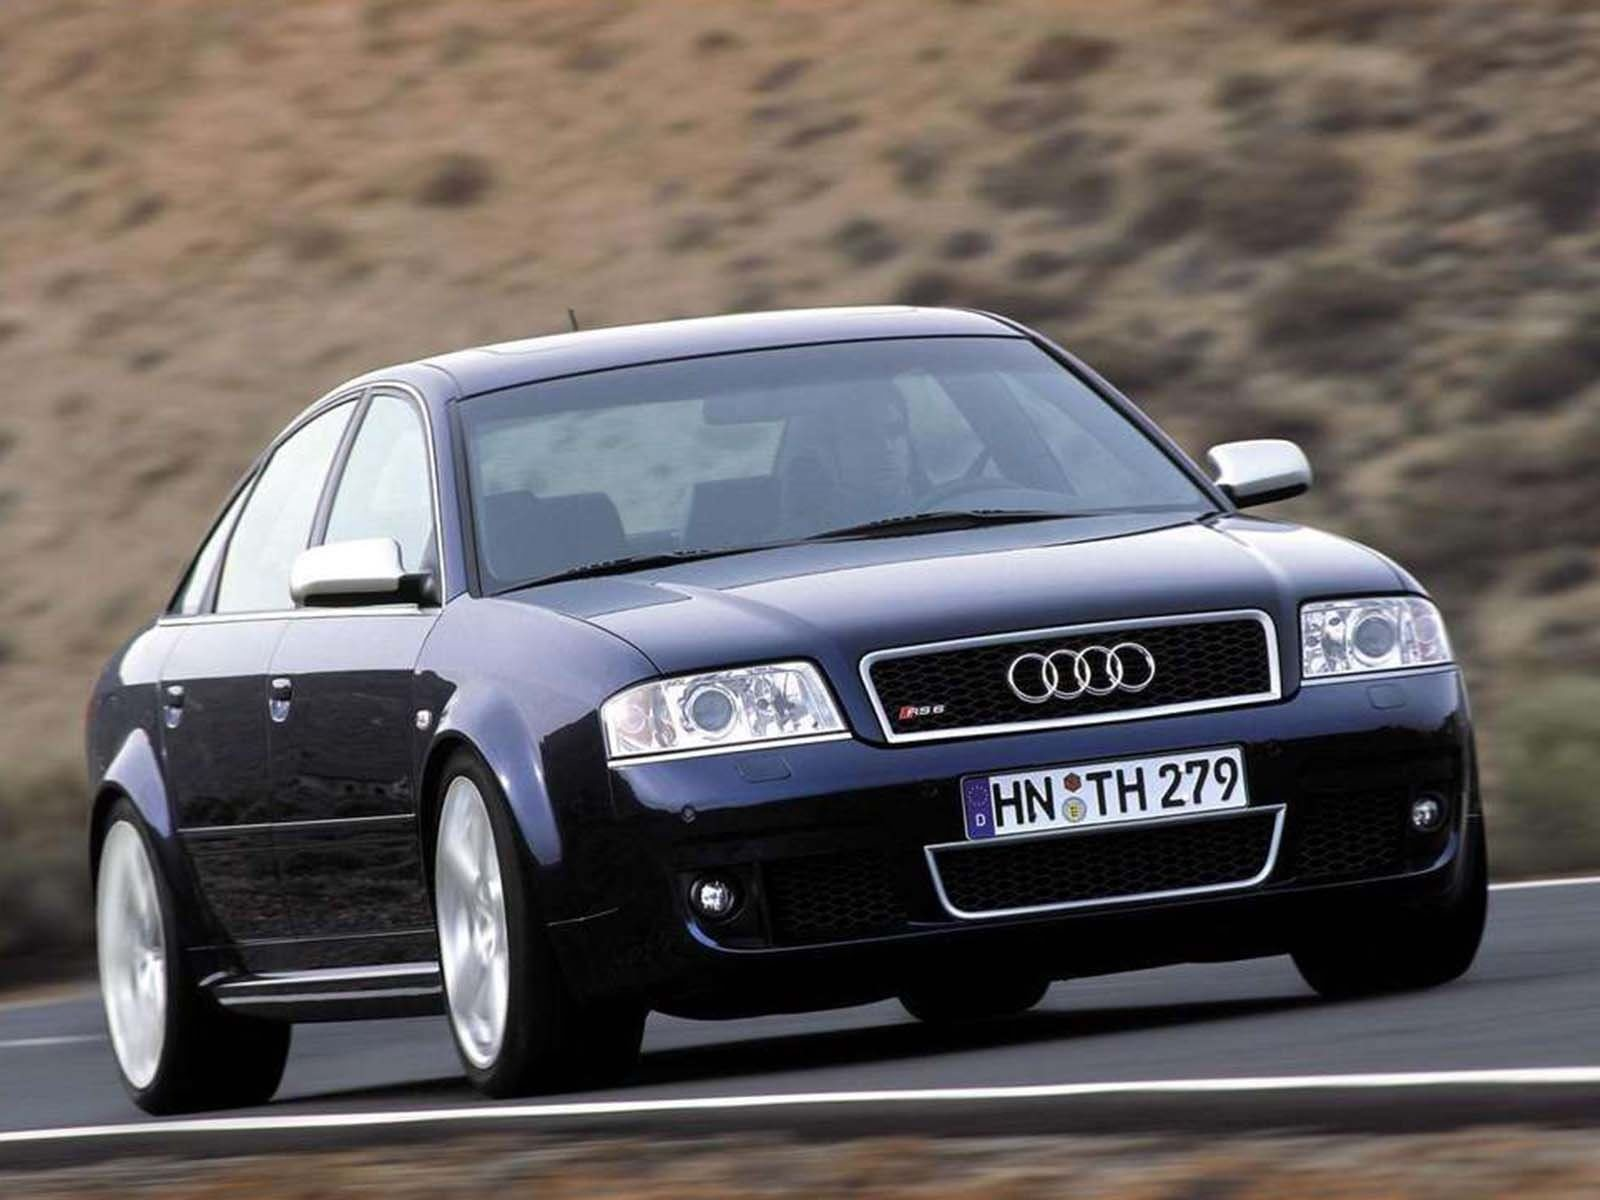 Kelebihan Audi Rs6 2003 Top Model Tahun Ini